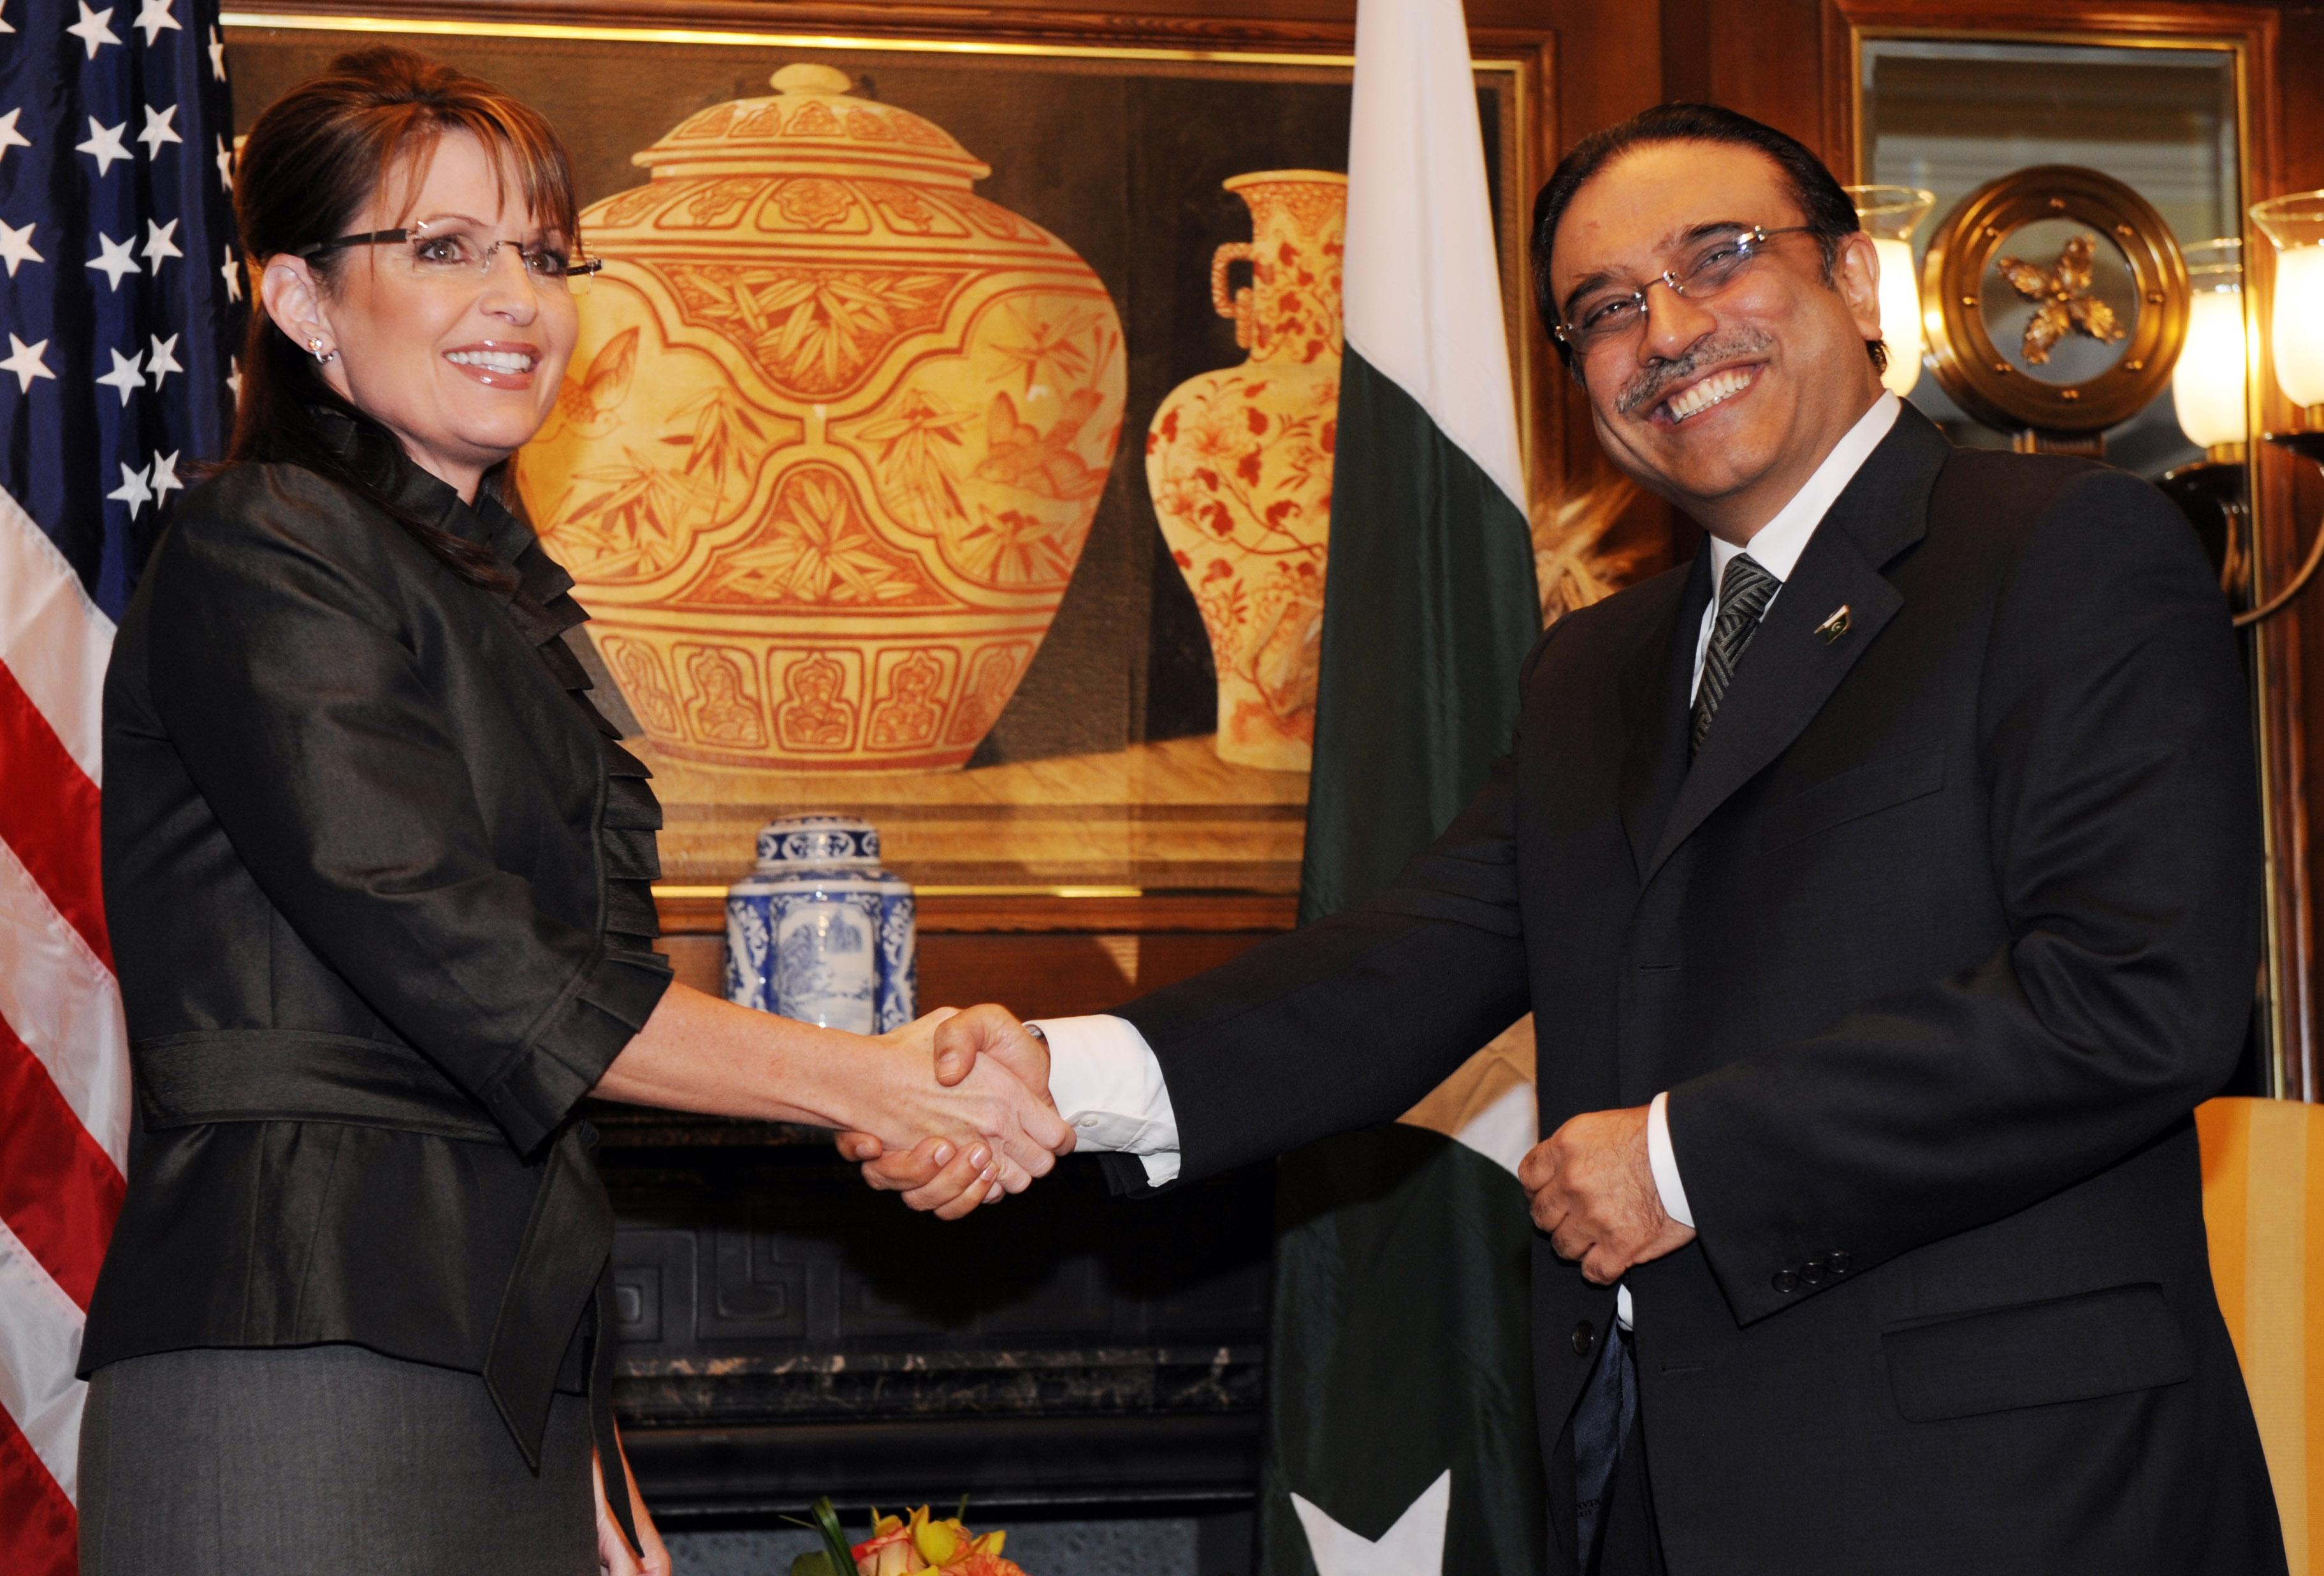 Alaska Gov. Sarah Palin meets Pakistan's President Asif Ali Zardari on Wednesday in New York.